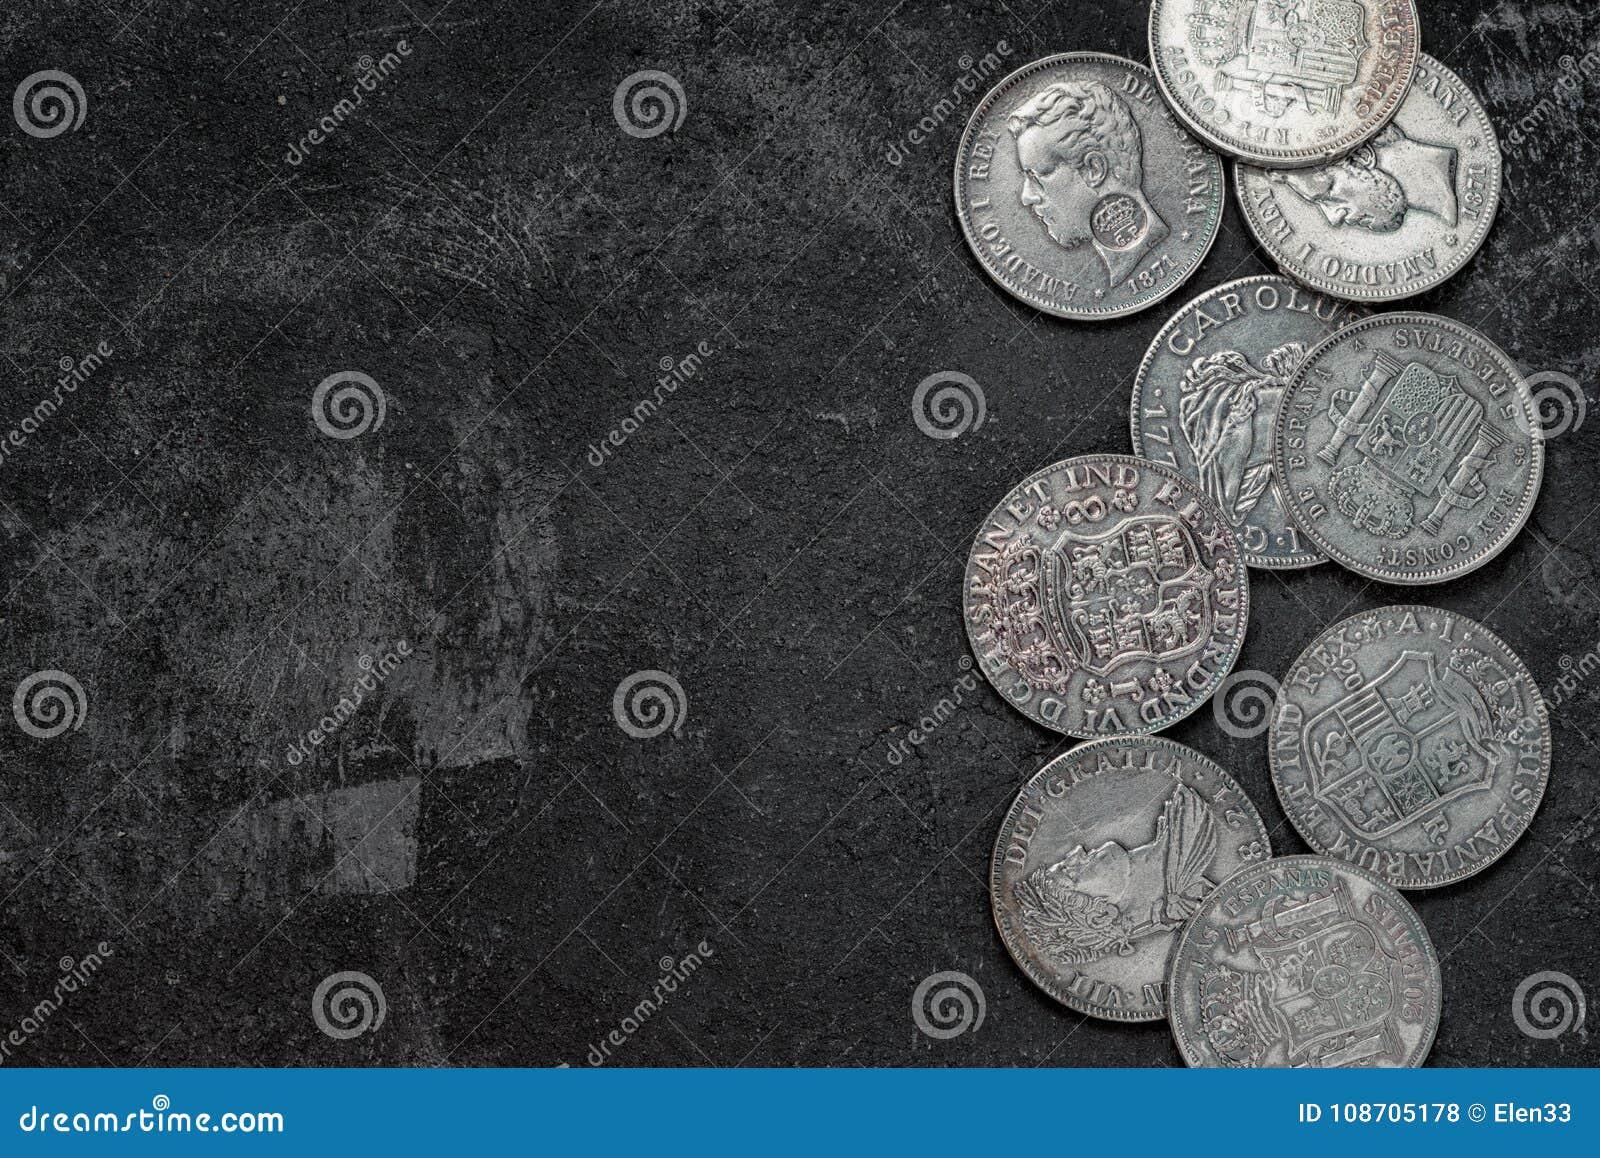 Monedas Españolas De Plata Antiguas Foto de archivo - Imagen de ...